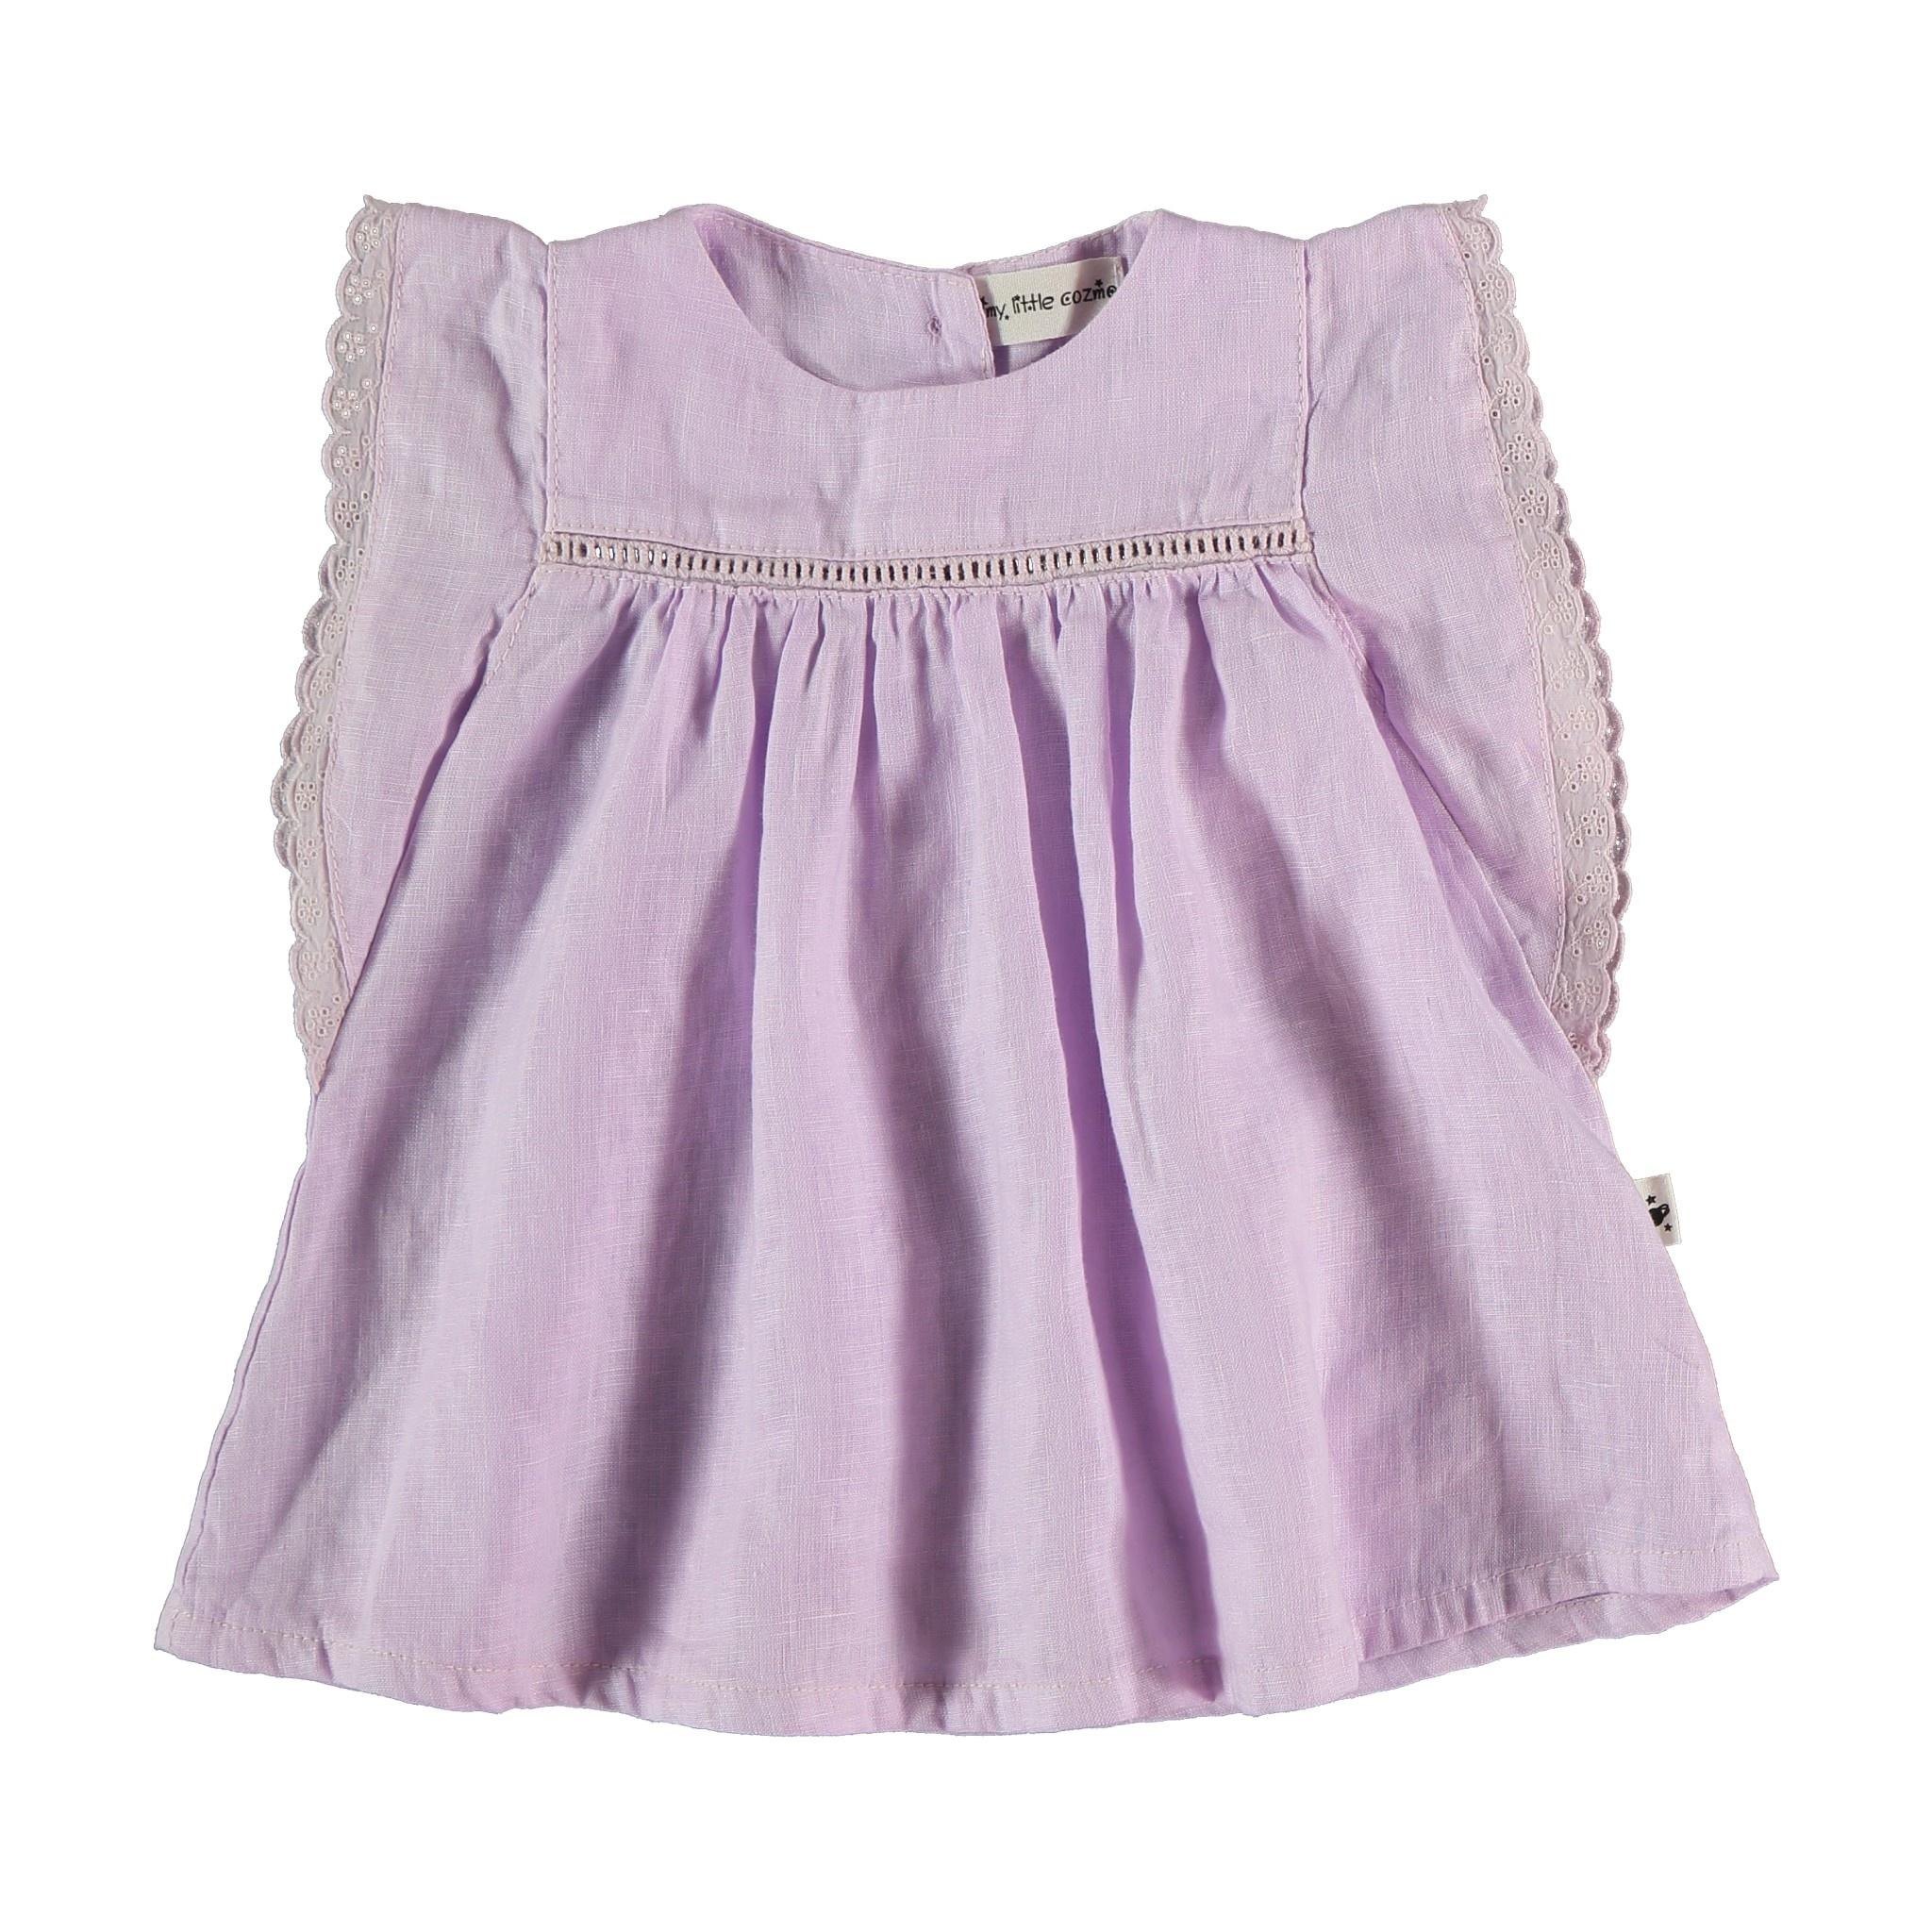 Novah linen dress mauve-1